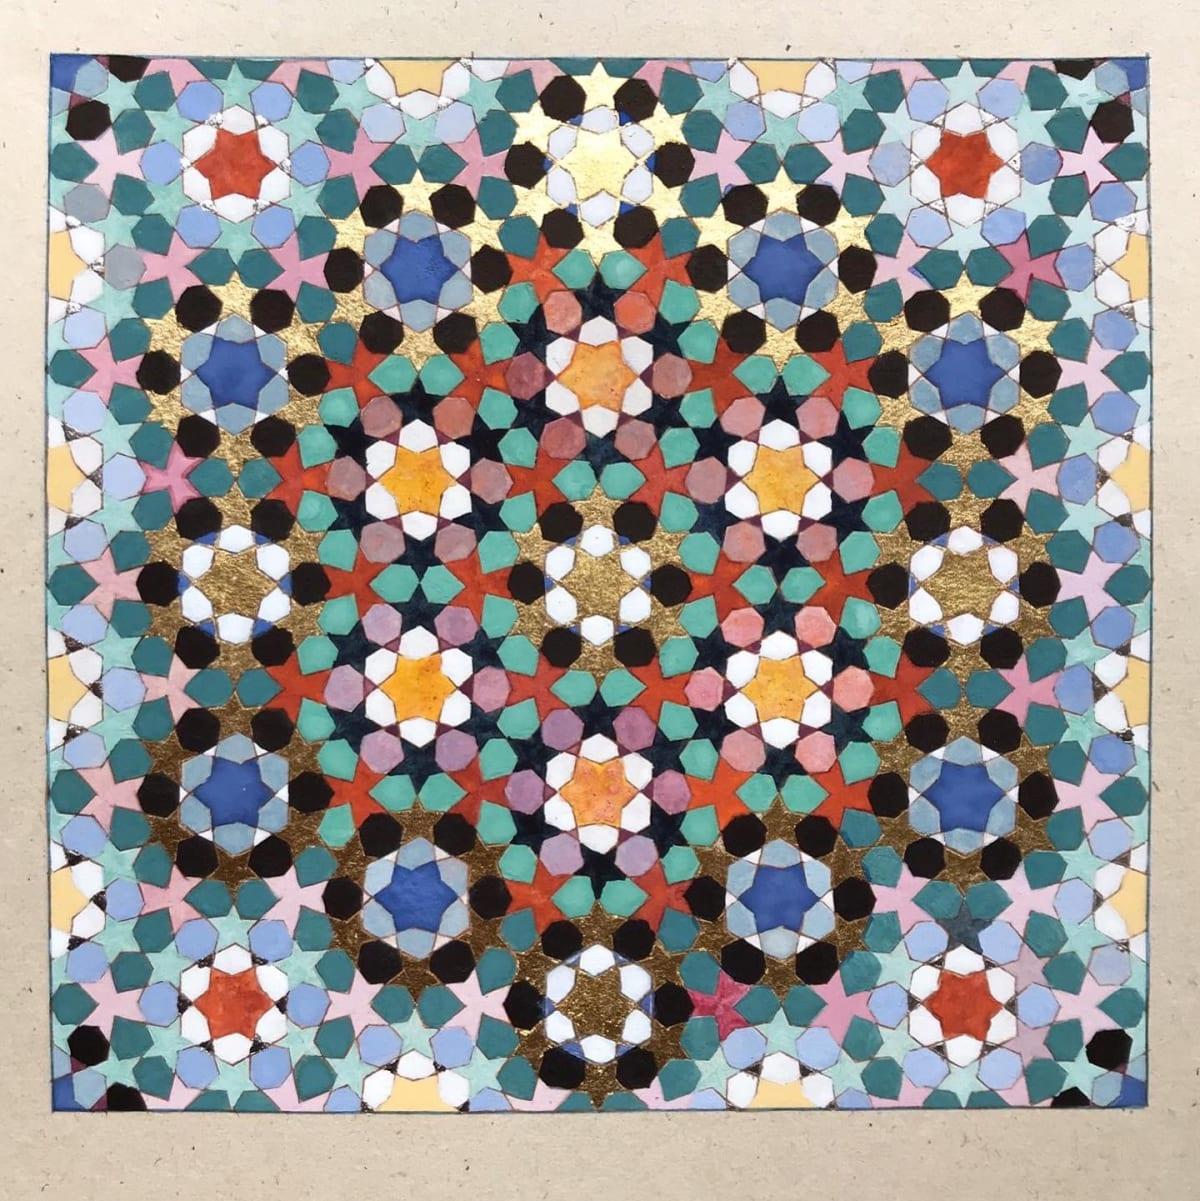 Elisabeth Deane b. 1985All Gifts, 2020 Italian gold leaf, palladium leaf, natural pigments and Arabic gum on handmade Indian hemp paper 16.8 x 17.4 cm 6 5/8 x 6 7/8 in